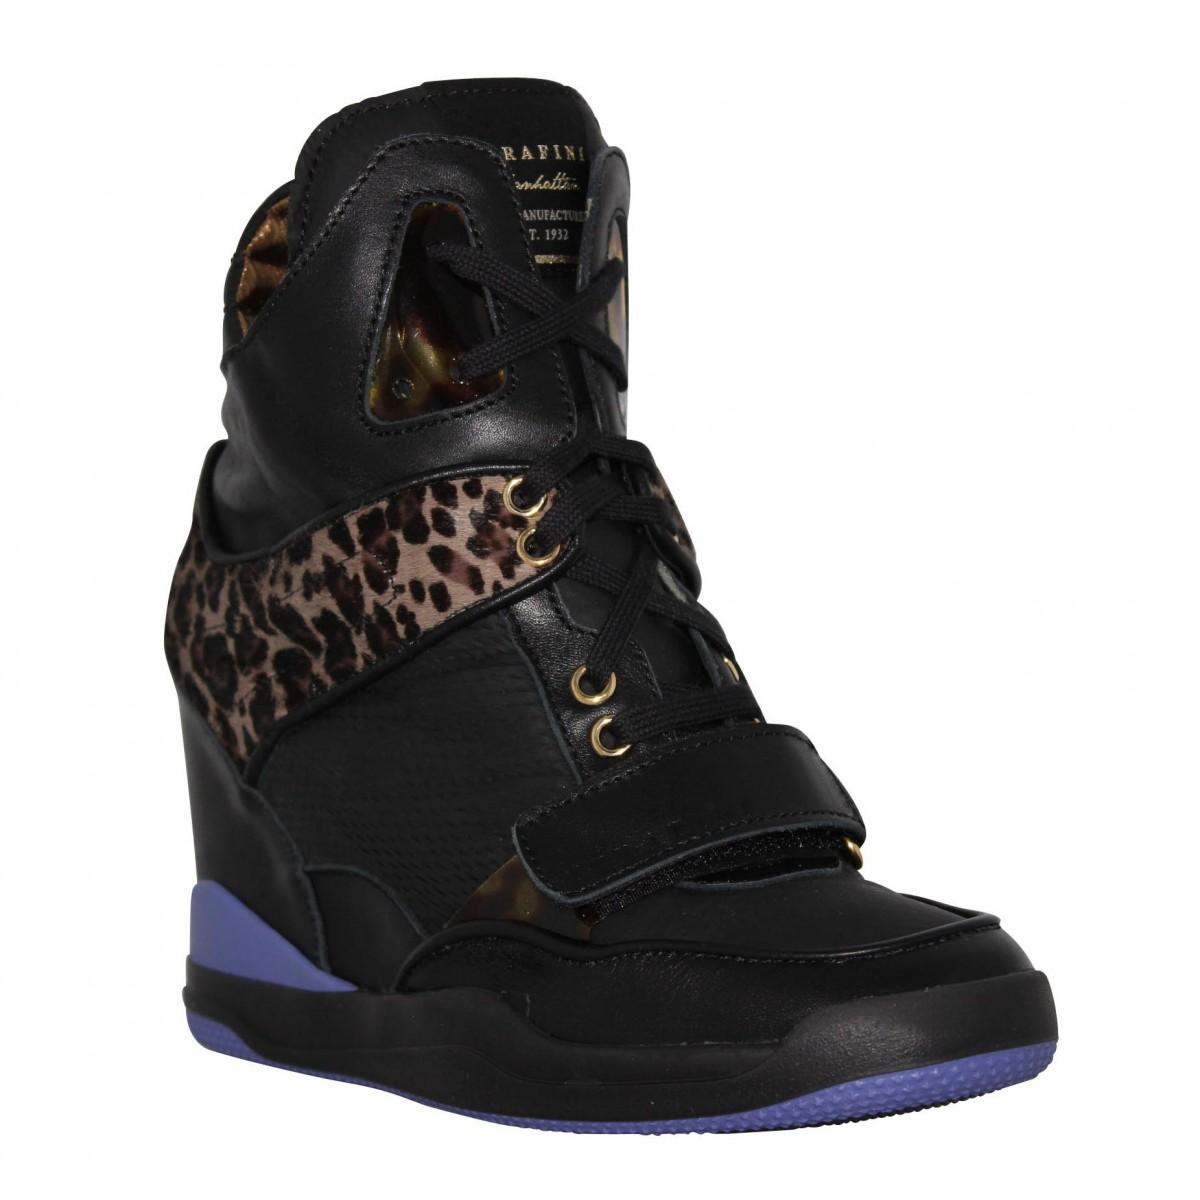 Bottines SERAFINI Madison cuir + leopard Femme Noir